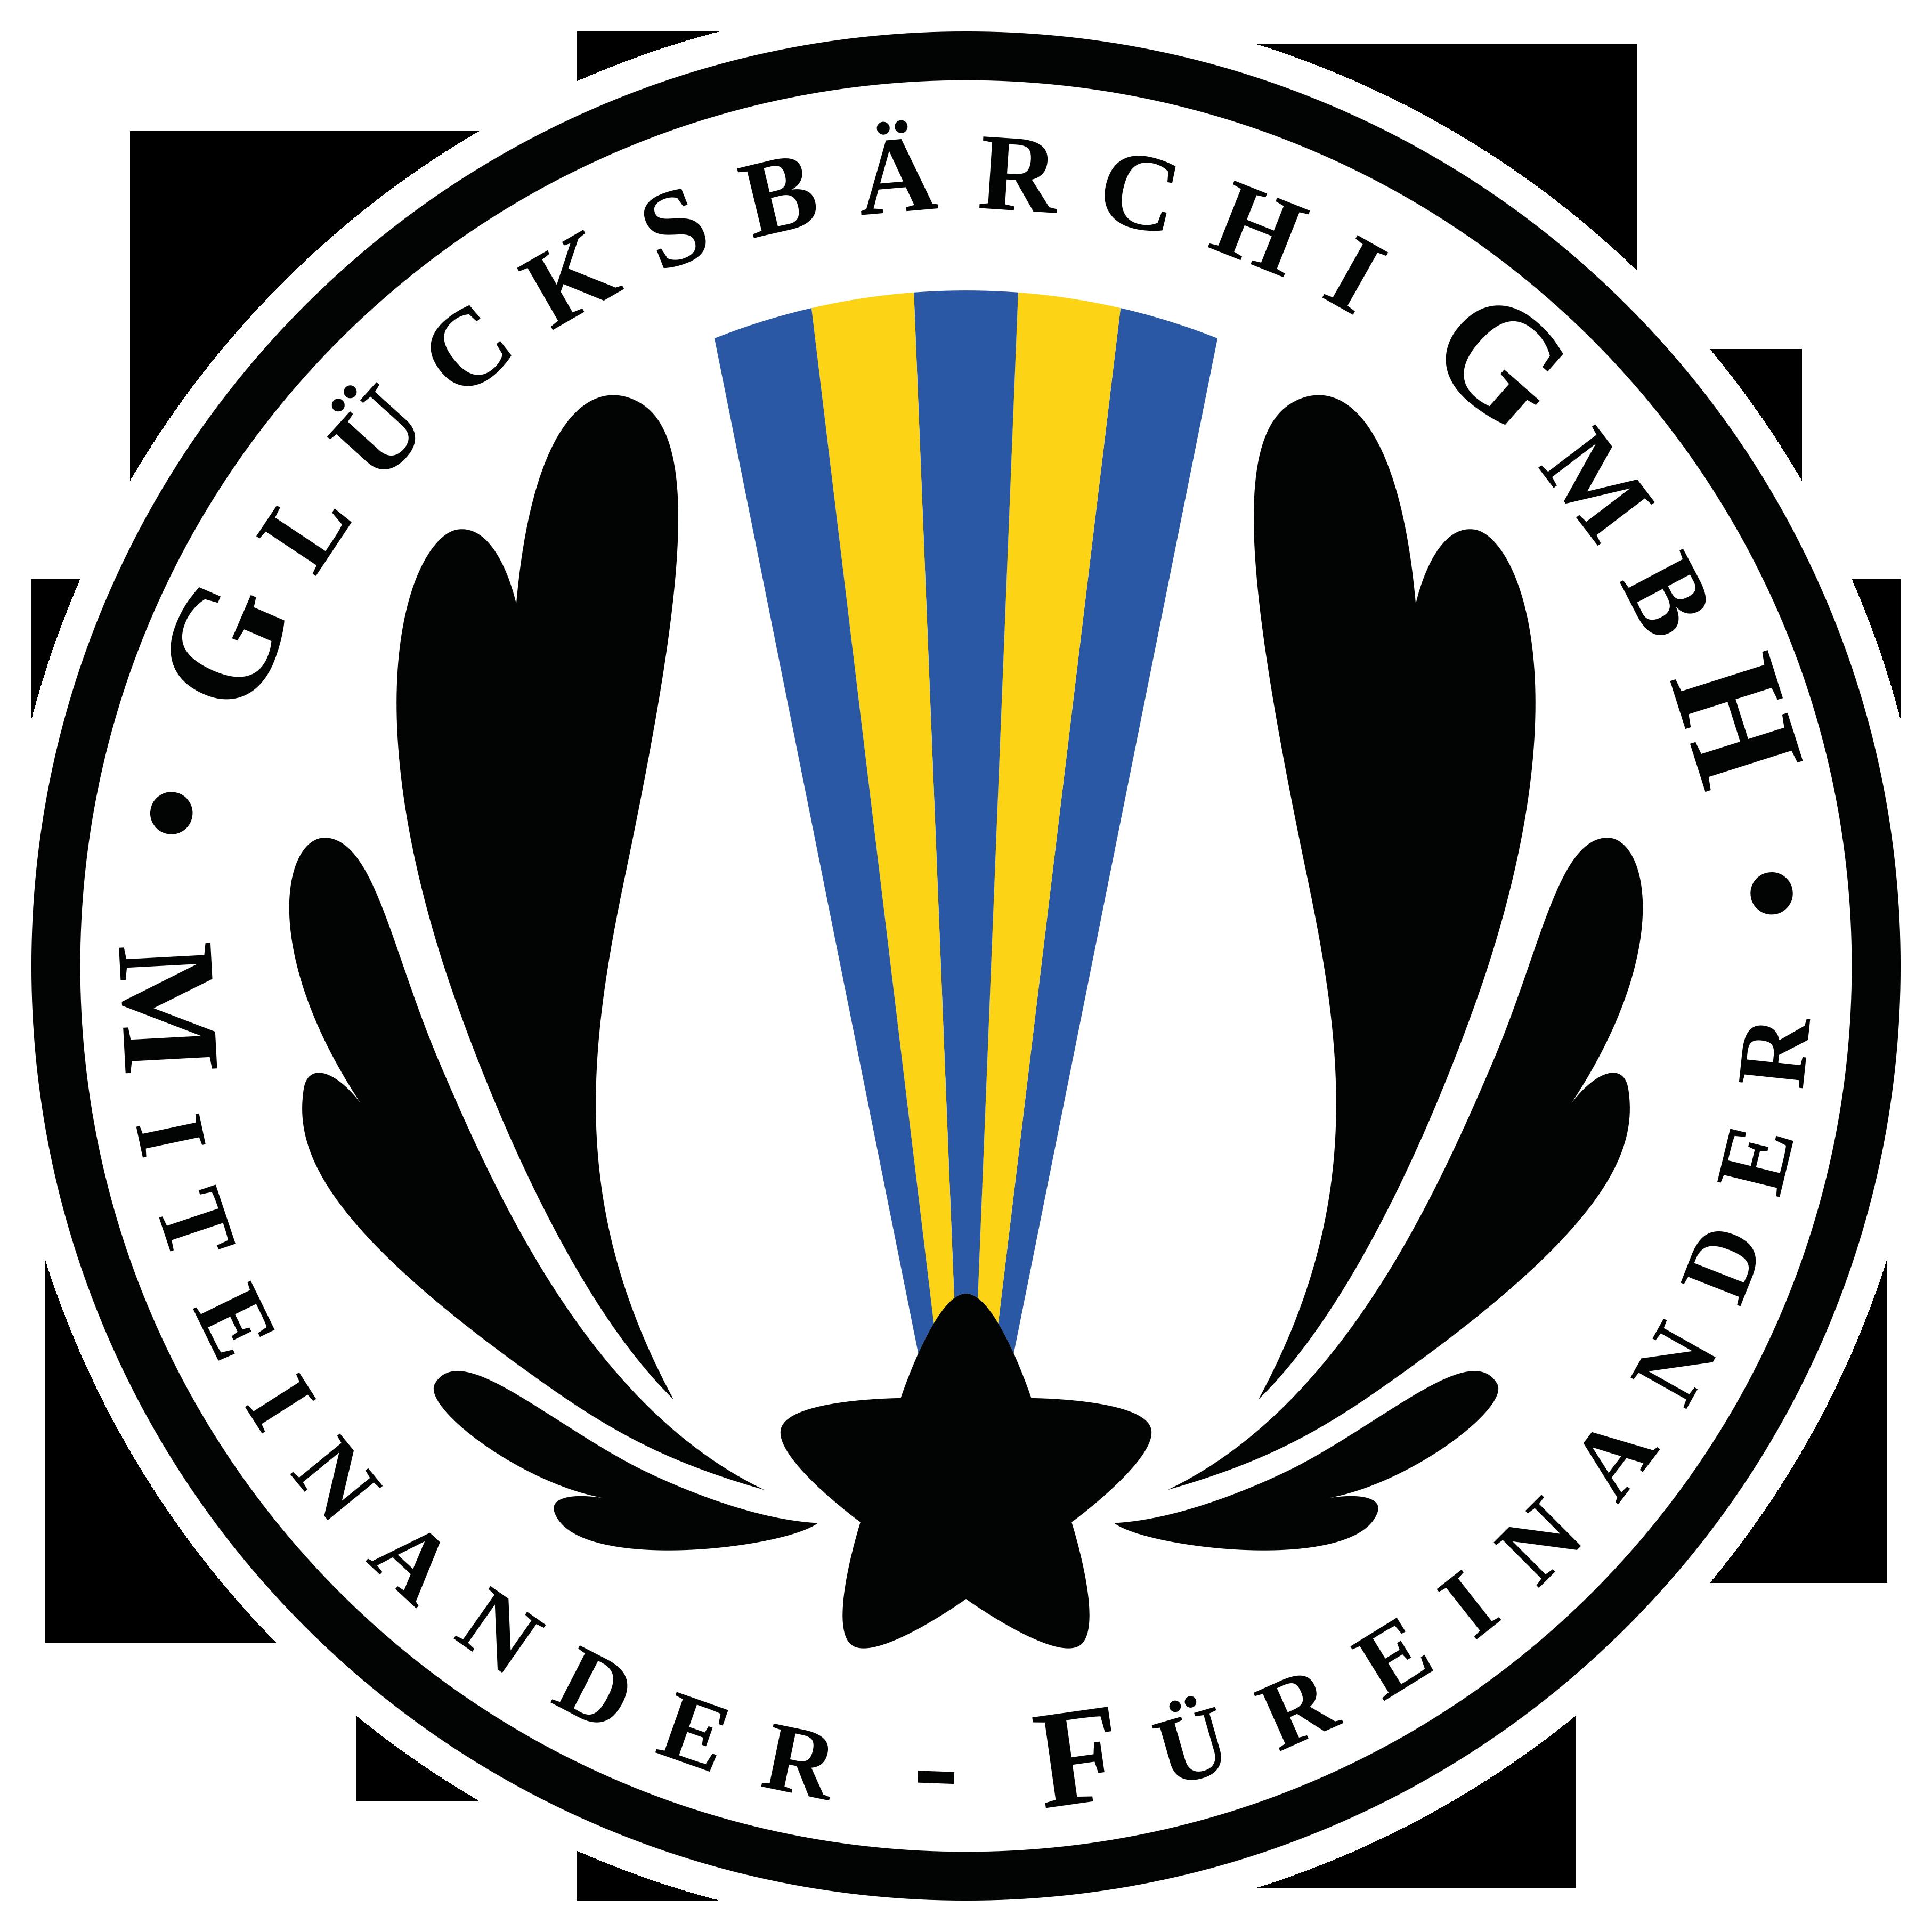 Republik Gilde Glücksbärchi GmbH